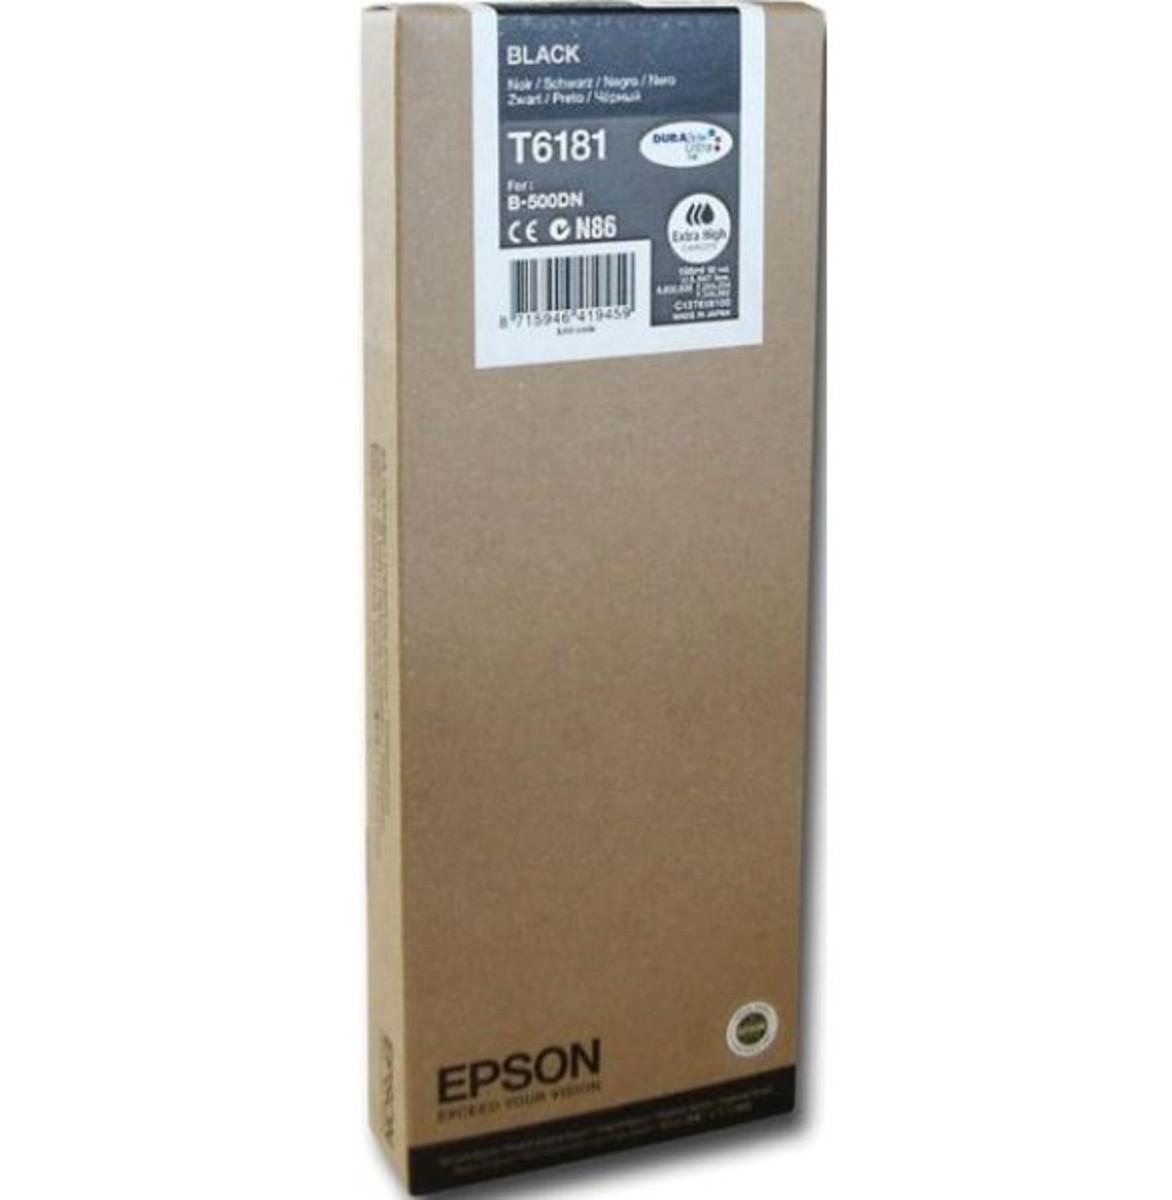 Epson C13T618100 Black Ink Cartridge - Extra High Yield